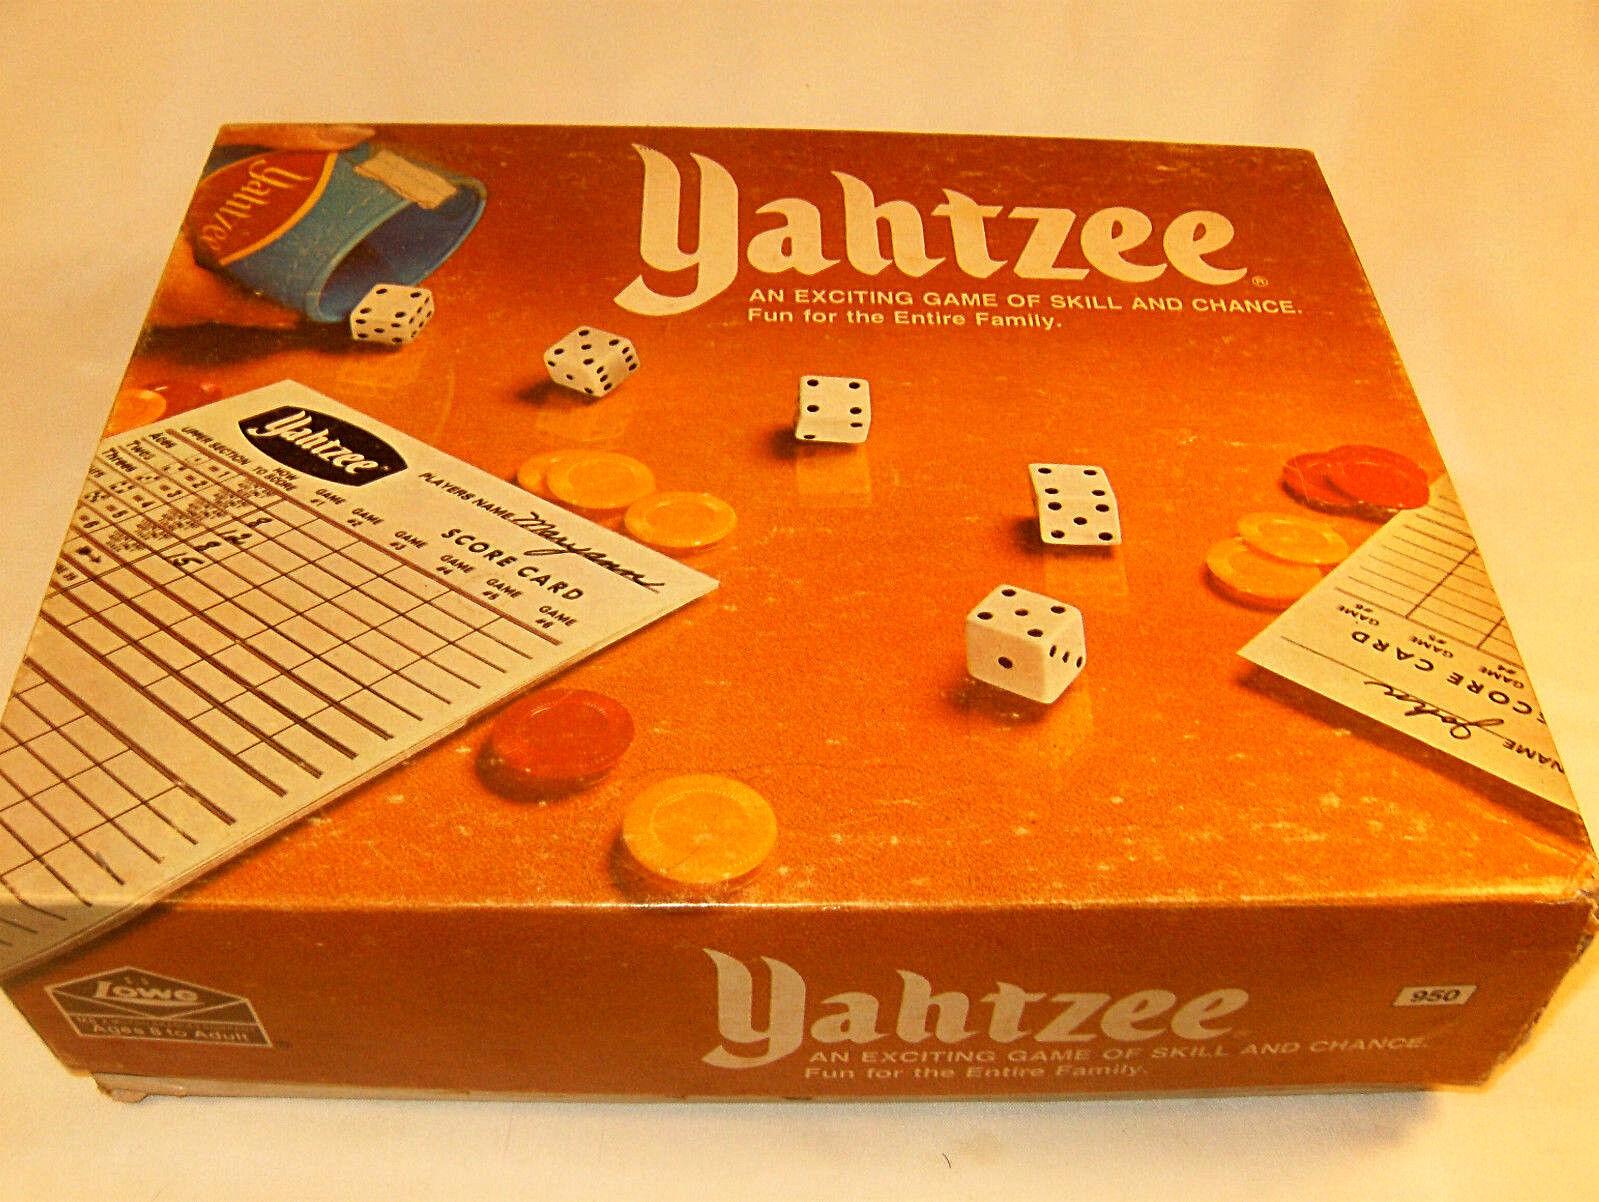 Vintage Dice 1975 ORIGINAL YAHTZEE Dice Vintage Family Board Game E.S. Niedrige Complete 9a79c0